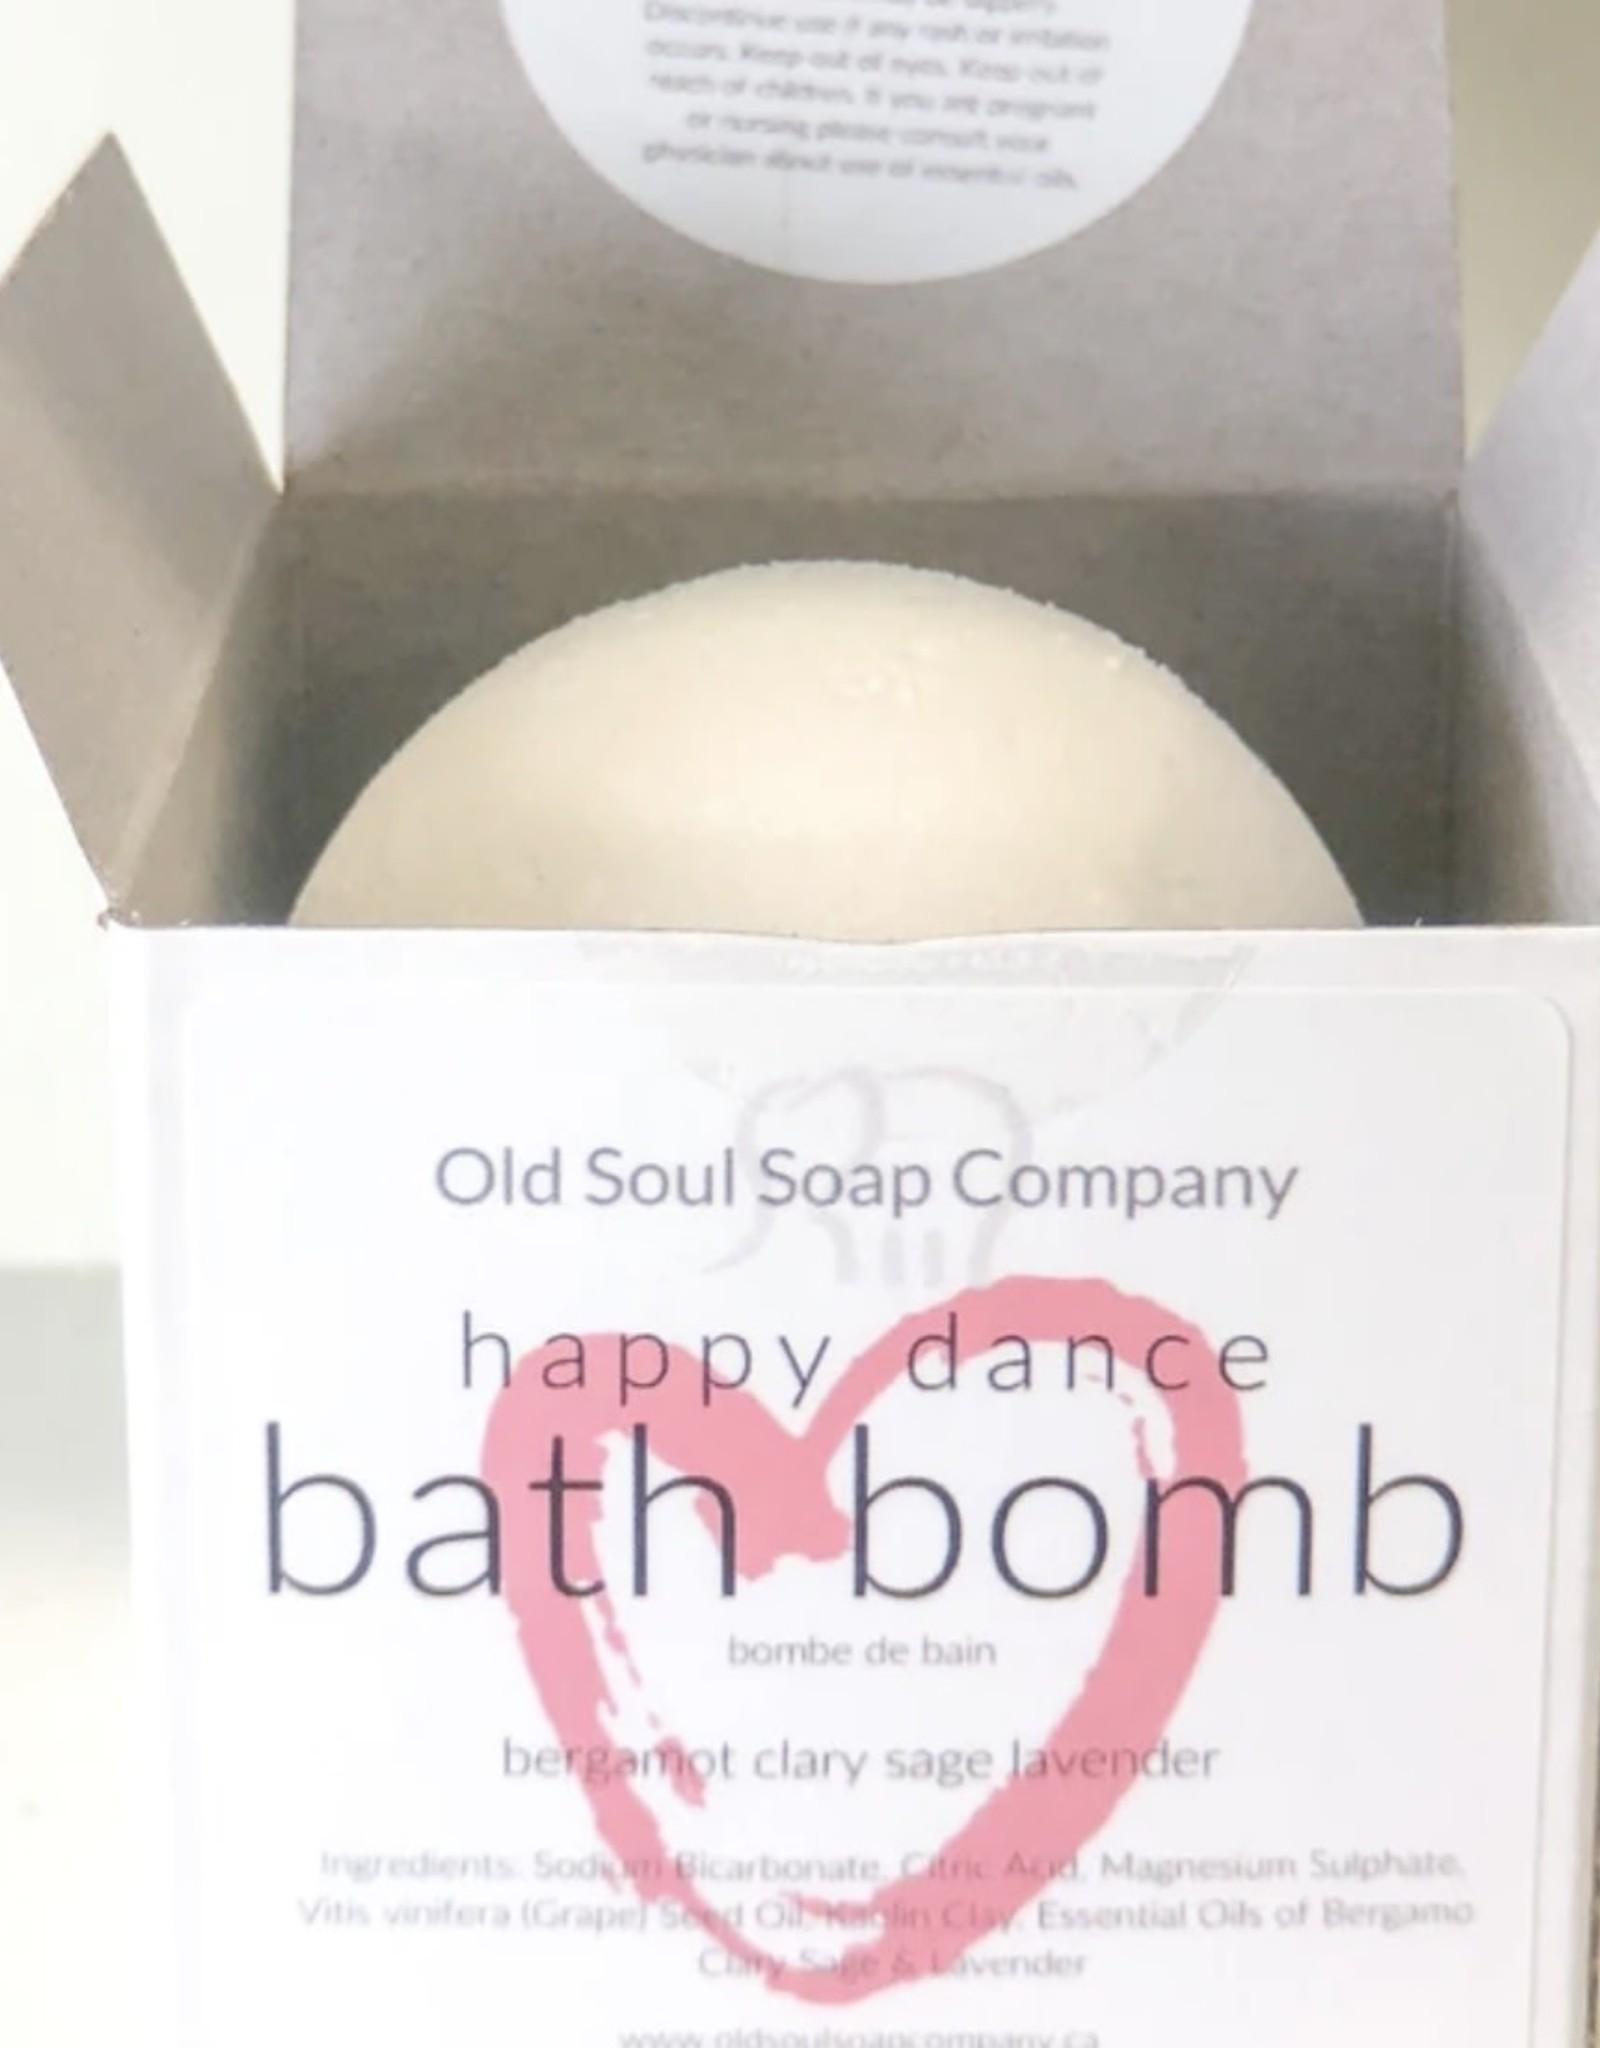 Old Soul Soap Company Bath Bomb Old Soul Soap Company